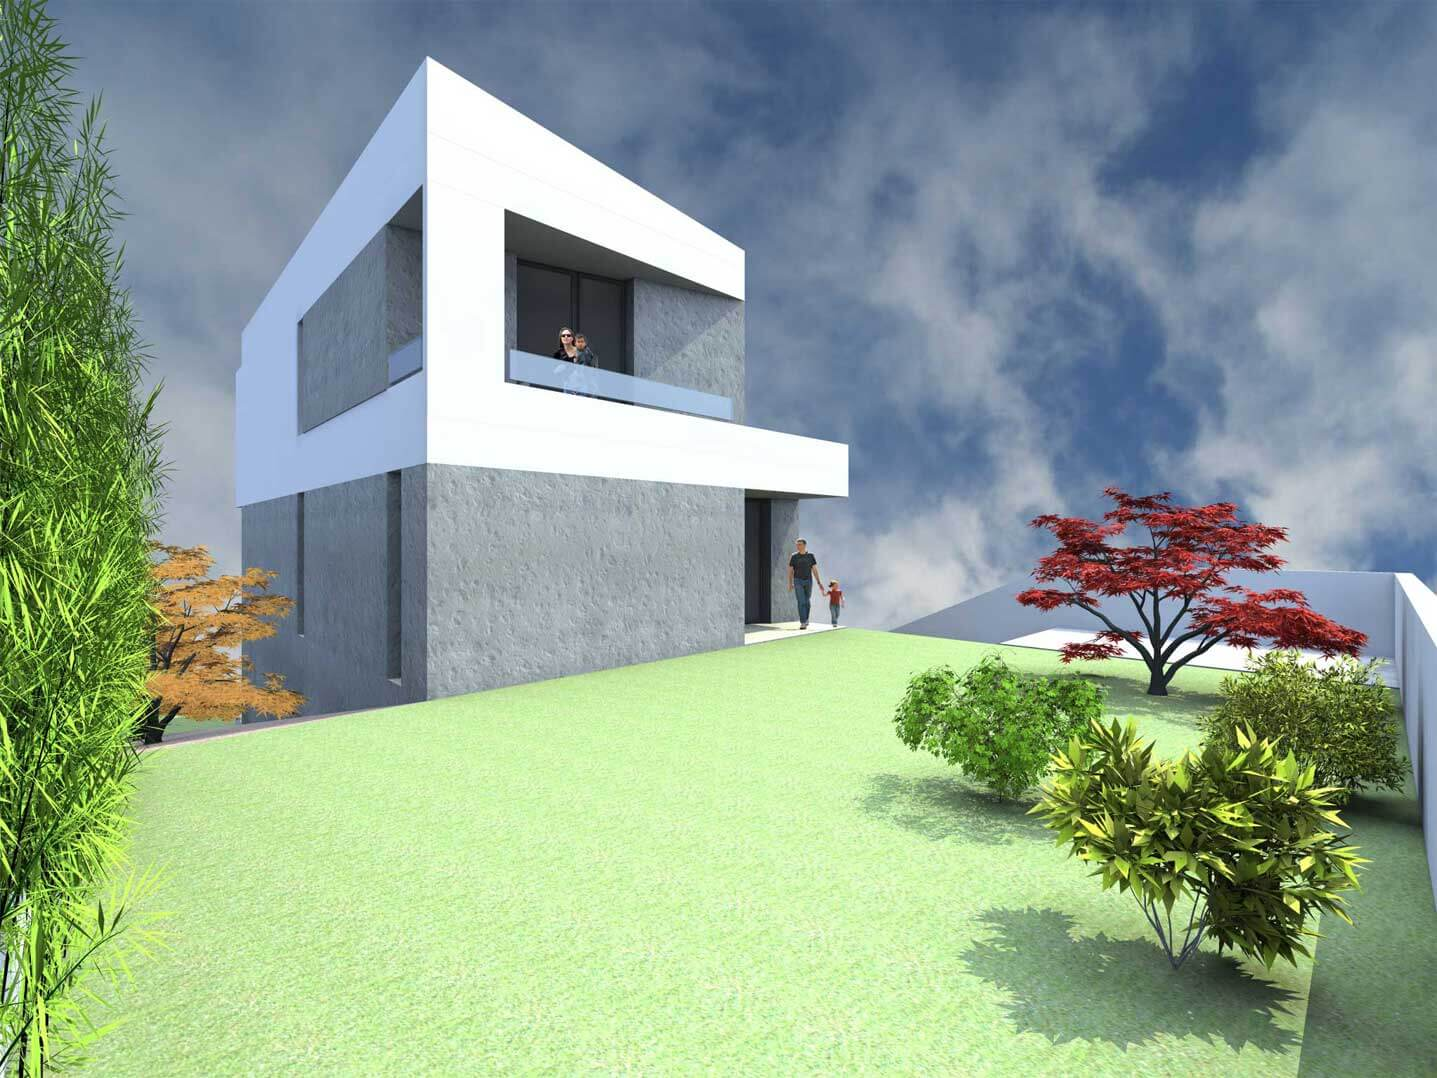 Moradia HFNC-render4